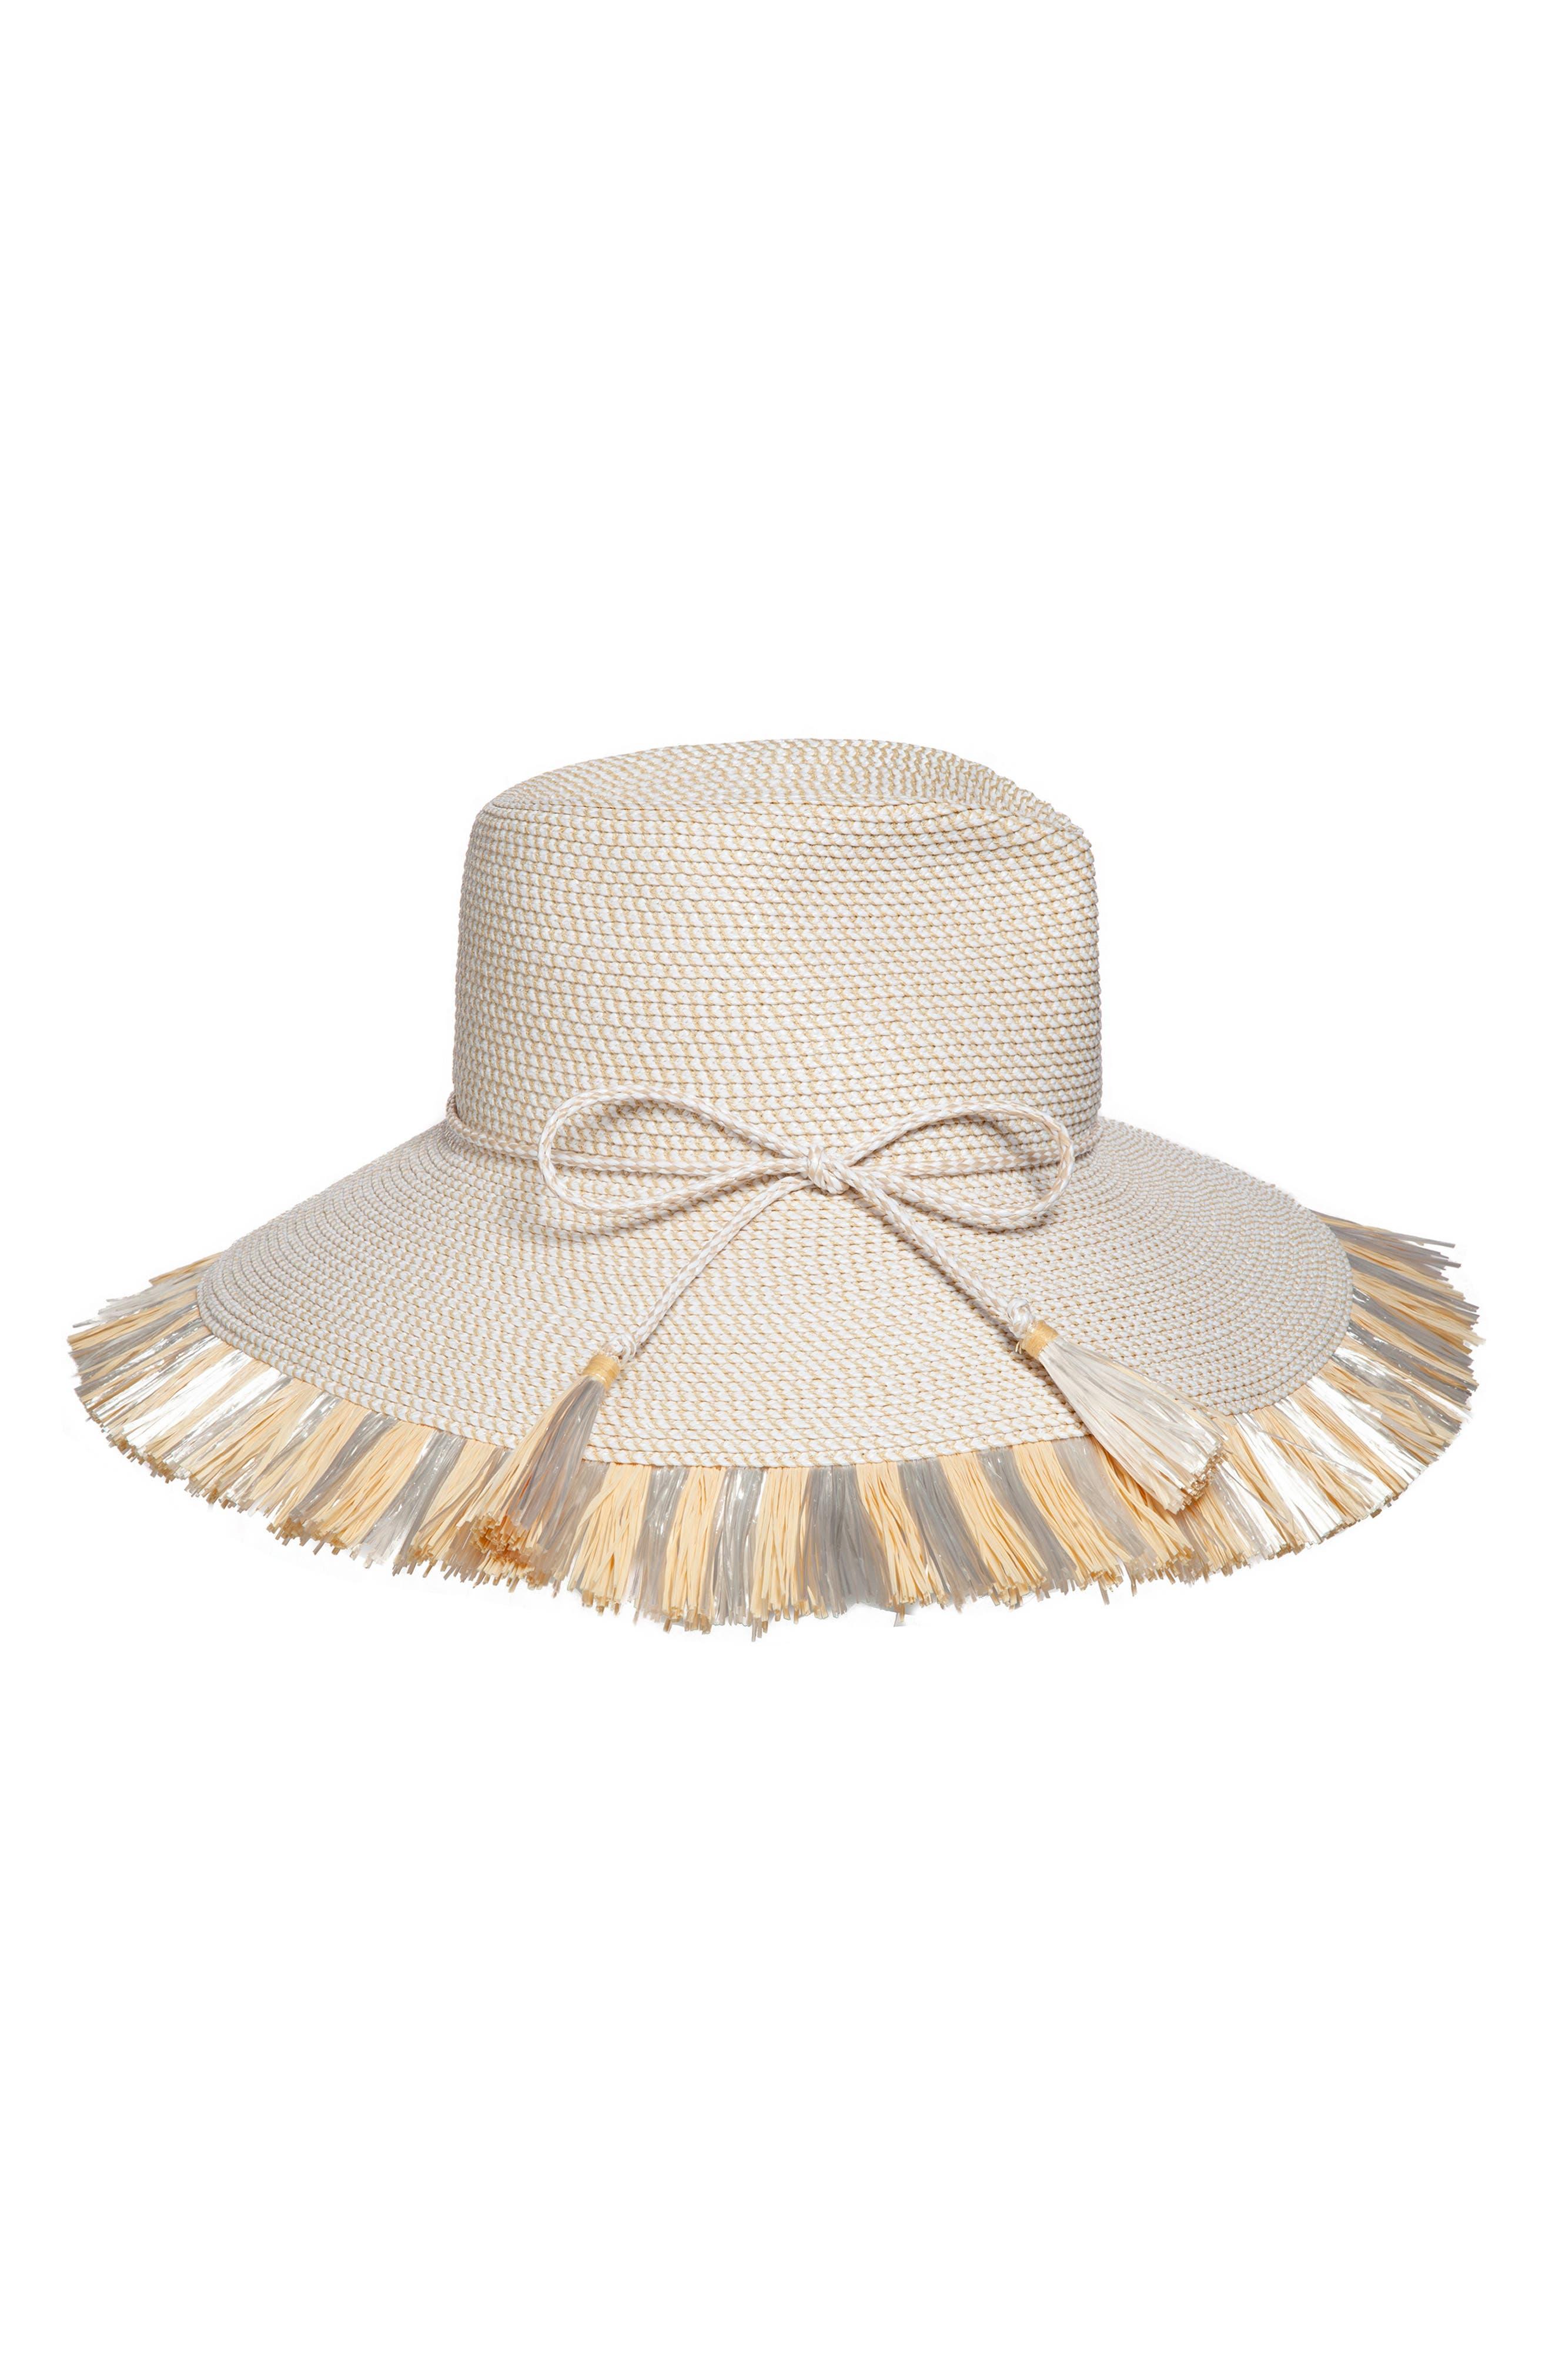 8e5382868b7 Eric Javits Antigua Squishee Tropical Sun Hat - White In White Mix ...